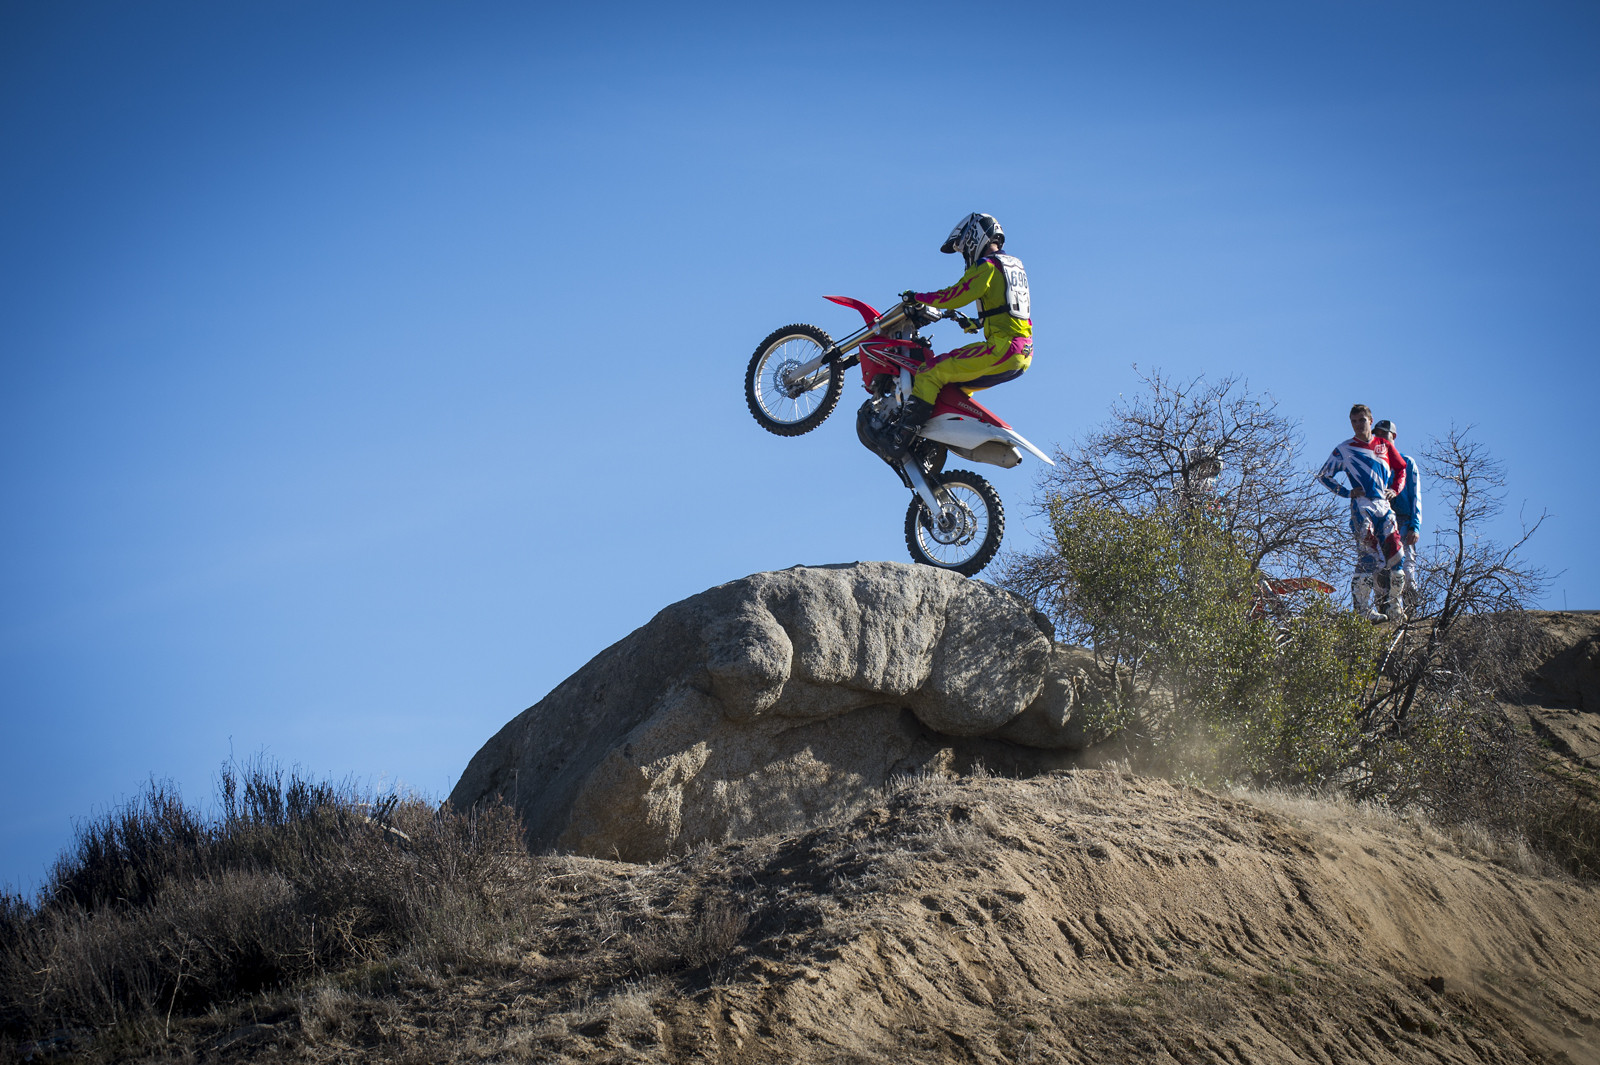 Noah Kepple - Ian Collins - Mountain Biking Pictures - Vital MTB